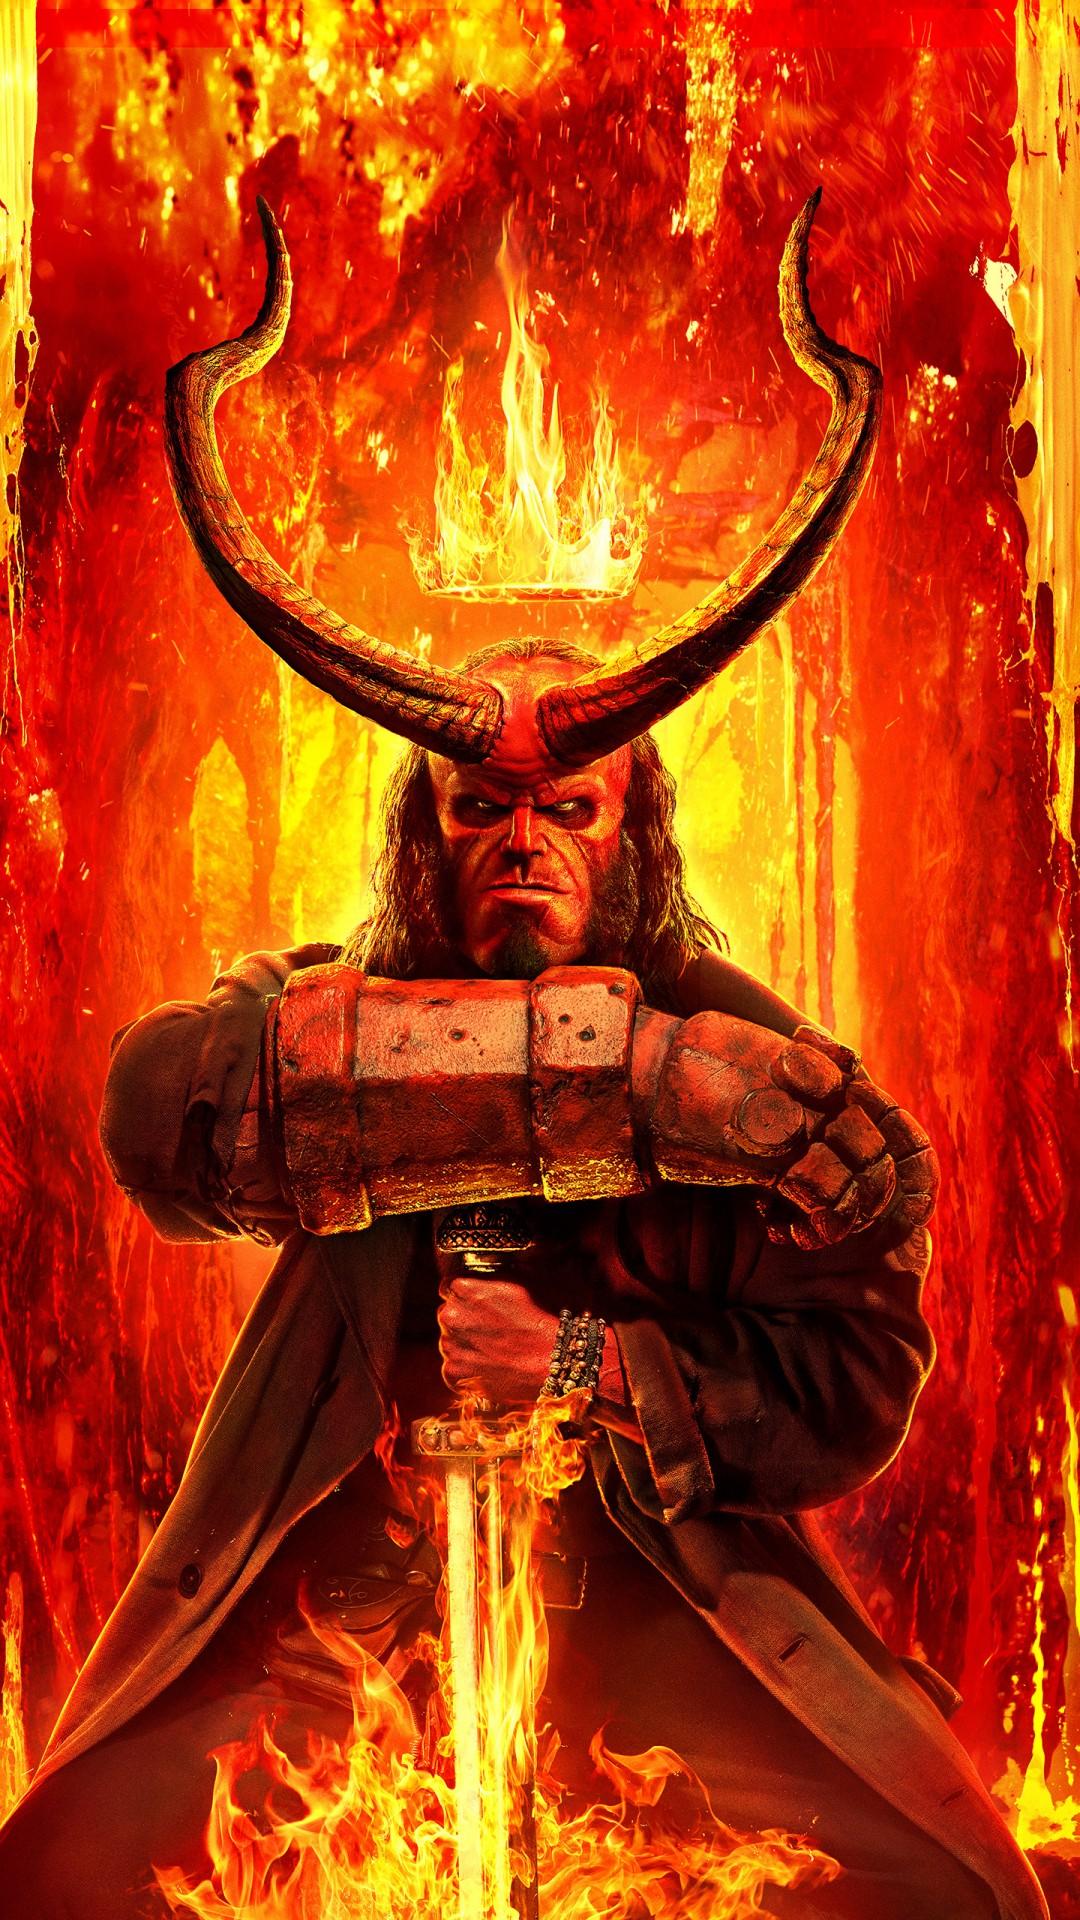 3d Skull Hd Wallpaper Download Hellboy 2019 4k Wallpapers Hd Wallpapers Id 27768